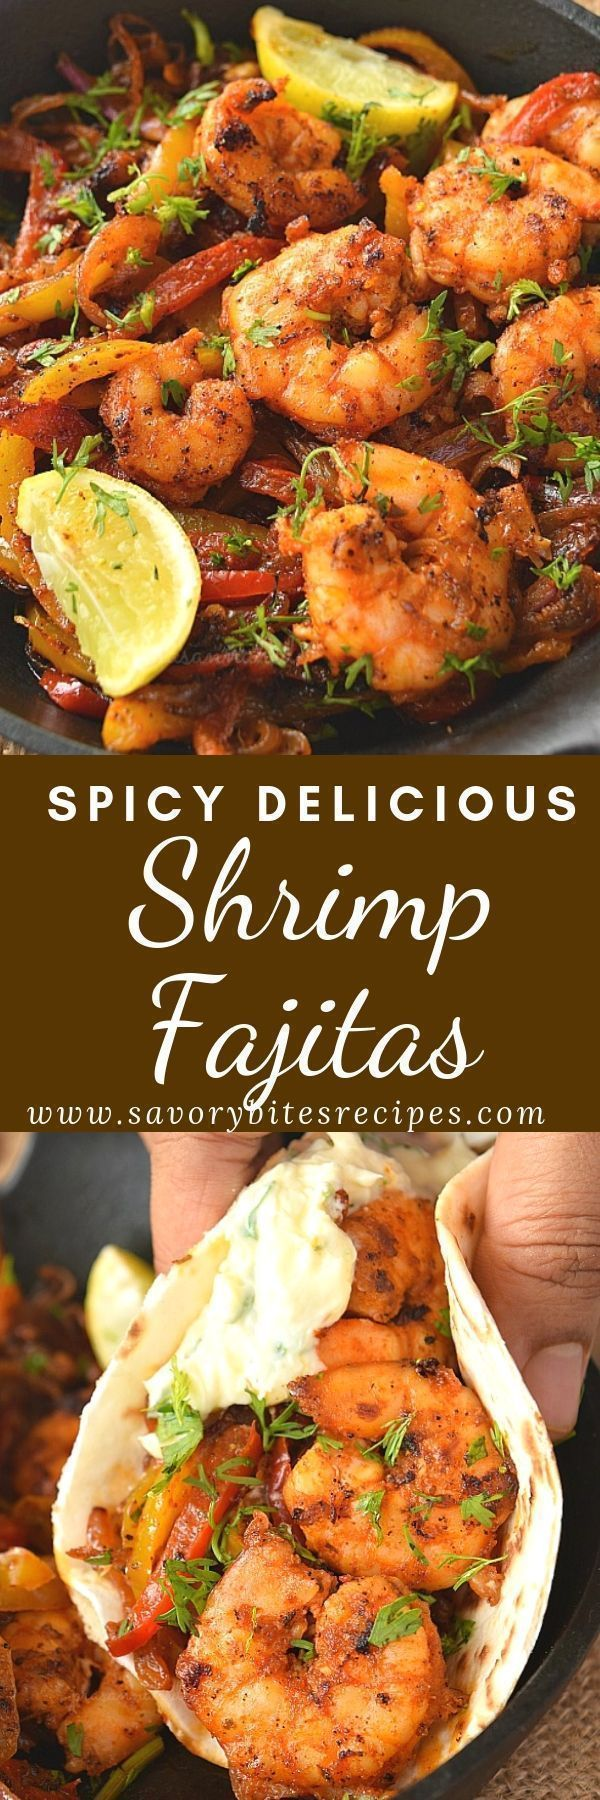 Shrimp Fajitas Recipe (Spicy Skillet Shrimp Fajitas) #shrimpfajitas Best and eas #shrimpfajitas Shrimp Fajitas Recipe (Spicy Skillet Shrimp Fajitas) #shrimpfajitas Best and eas #shrimpfajitas Shrimp Fajitas Recipe (Spicy Skillet Shrimp Fajitas) #shrimpfajitas Best and eas #shrimpfajitas Shrimp Fajitas Recipe (Spicy Skillet Shrimp Fajitas) #shrimpfajitas Best and eas